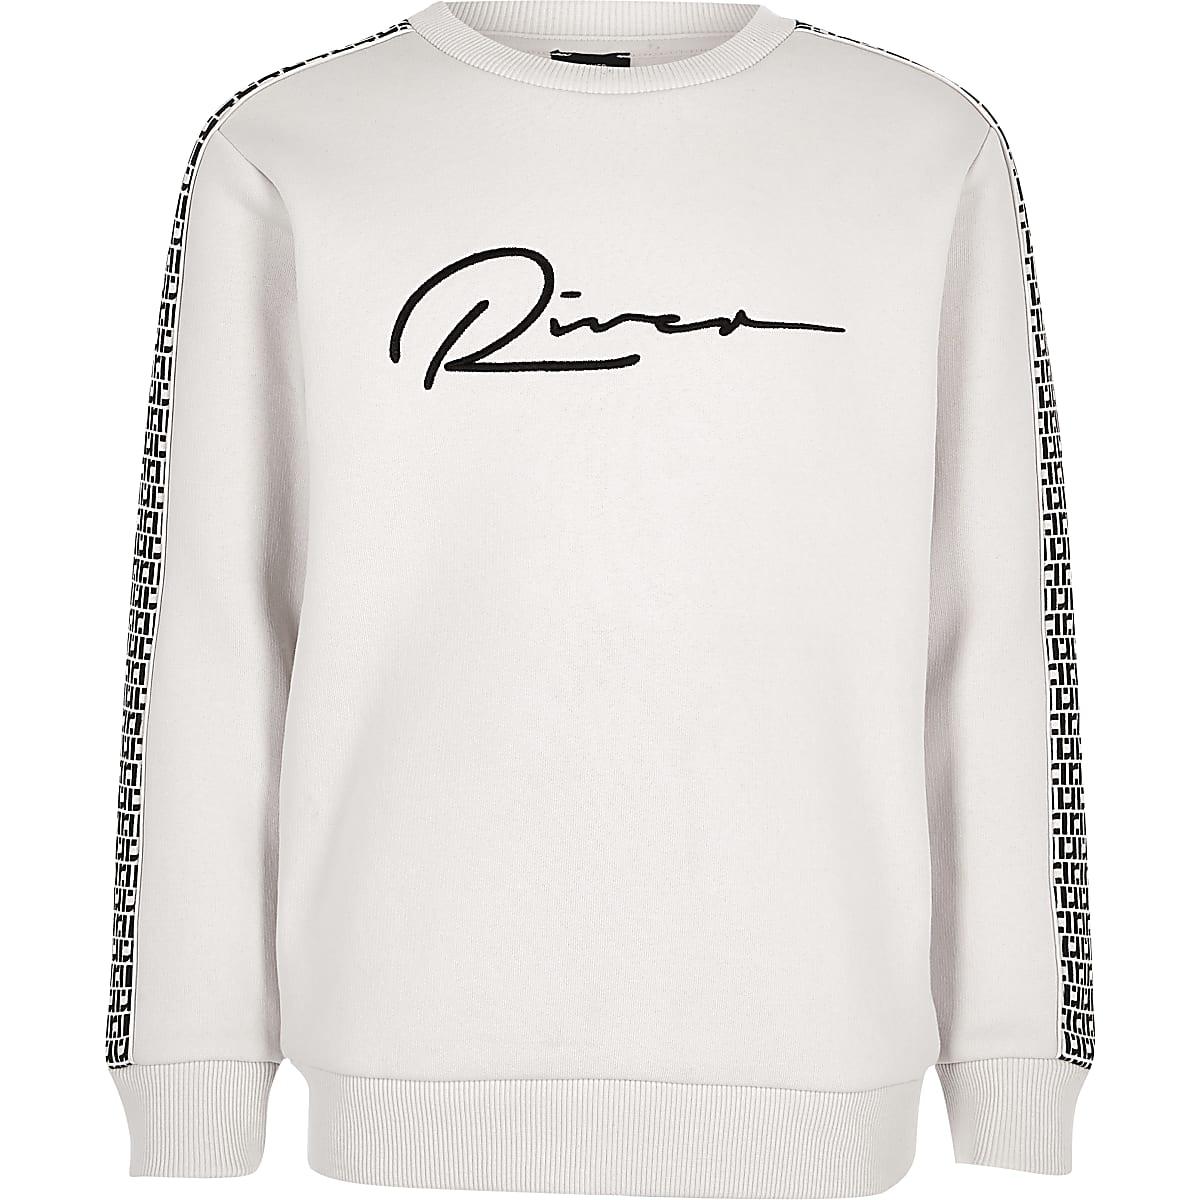 Sweatshirt in Ecru